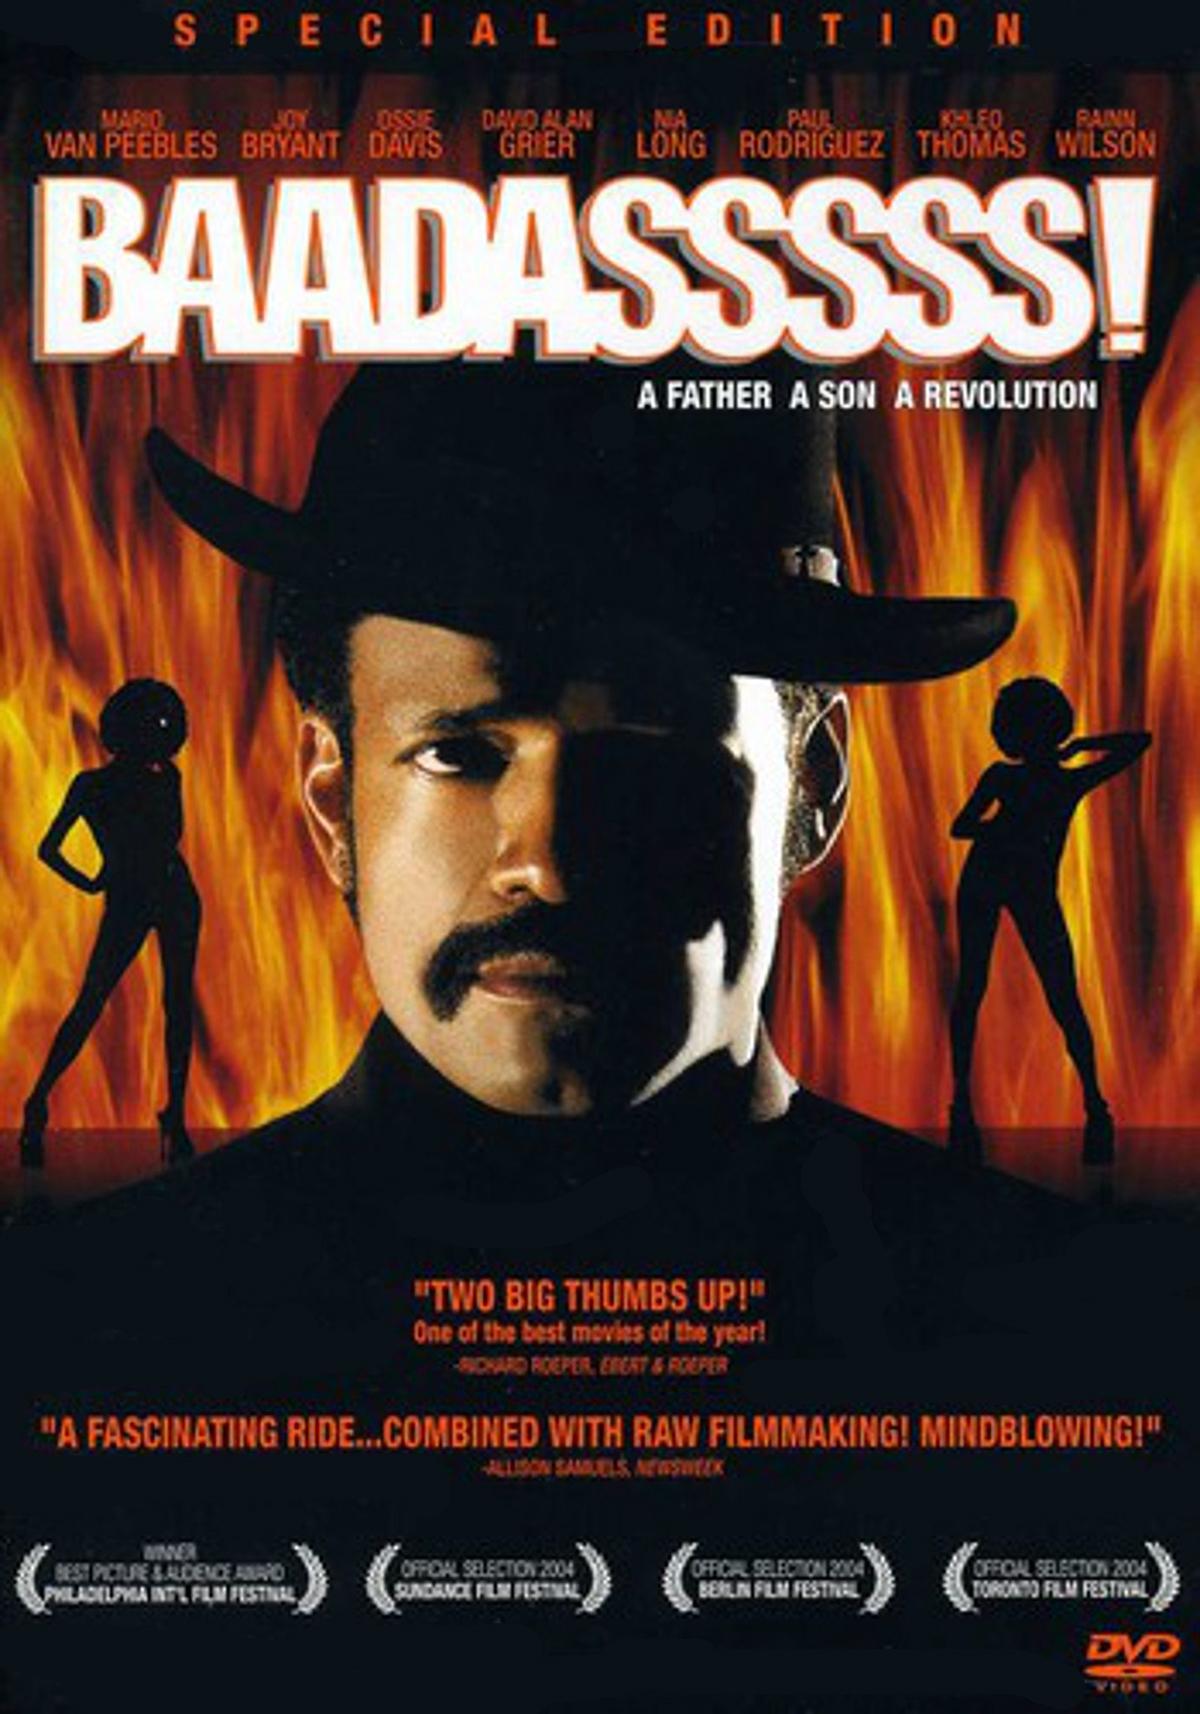 DVD Review: BAADASSSSS! - Slant Magazine